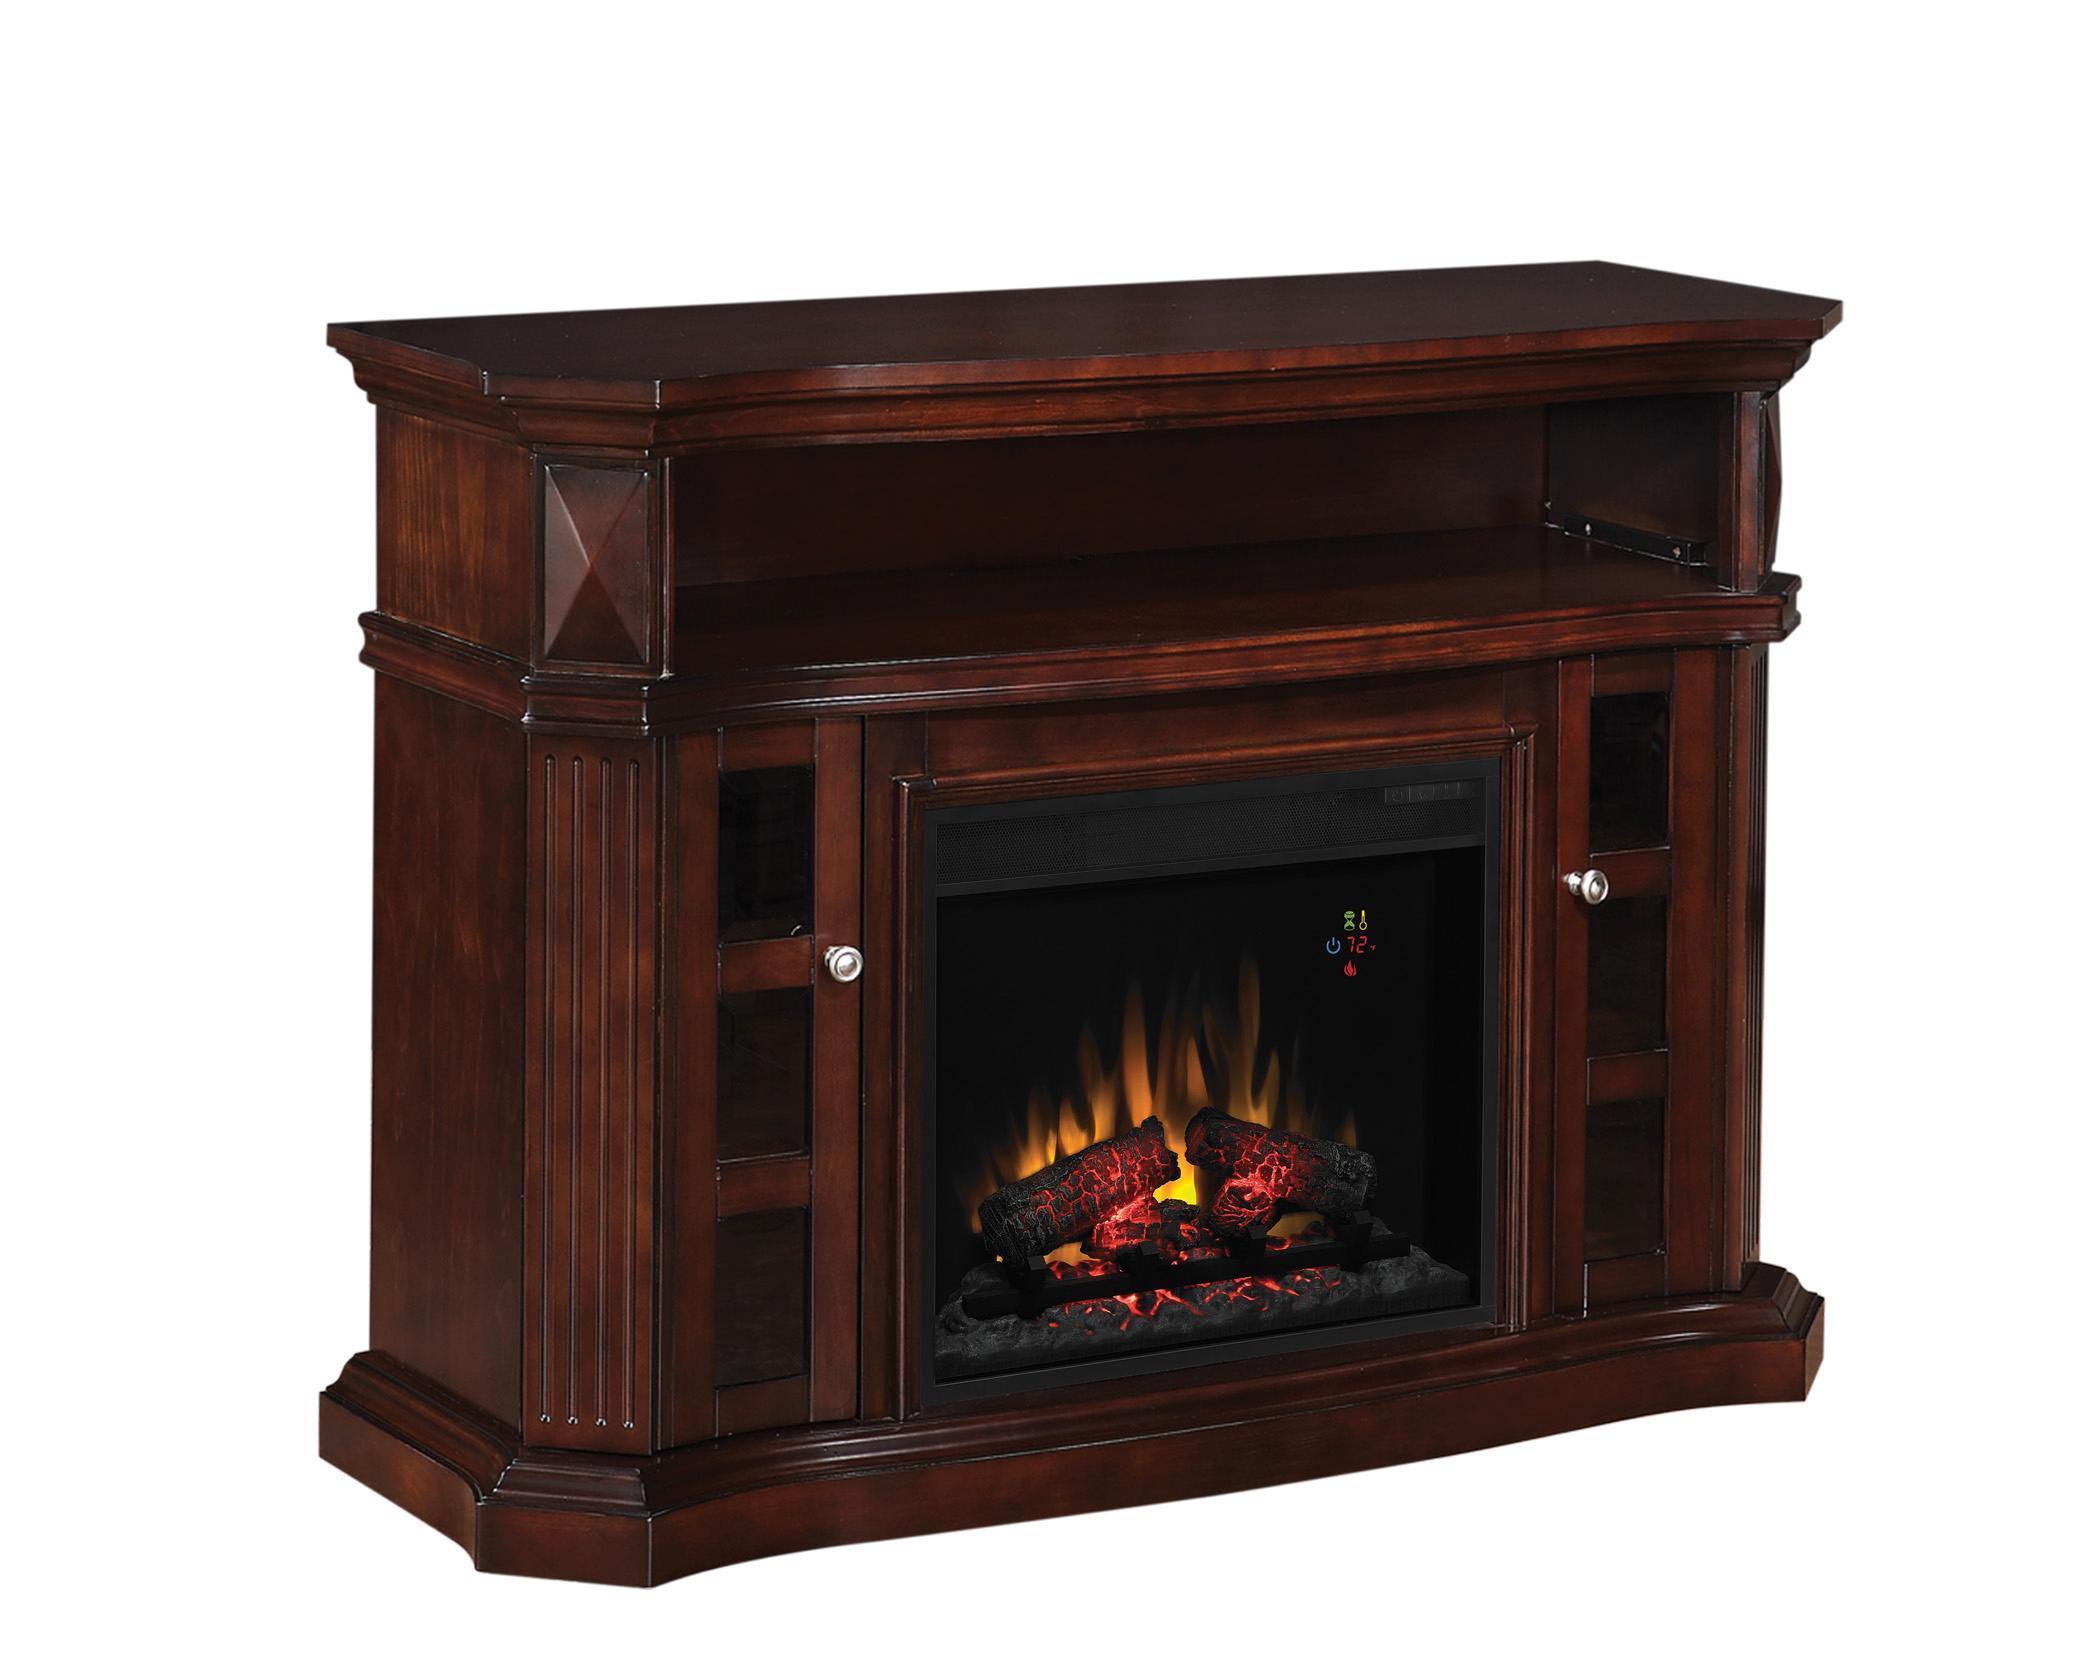 Amazon.com - ClassicFlame 23MM774-E451 Bellemeade TV Stand